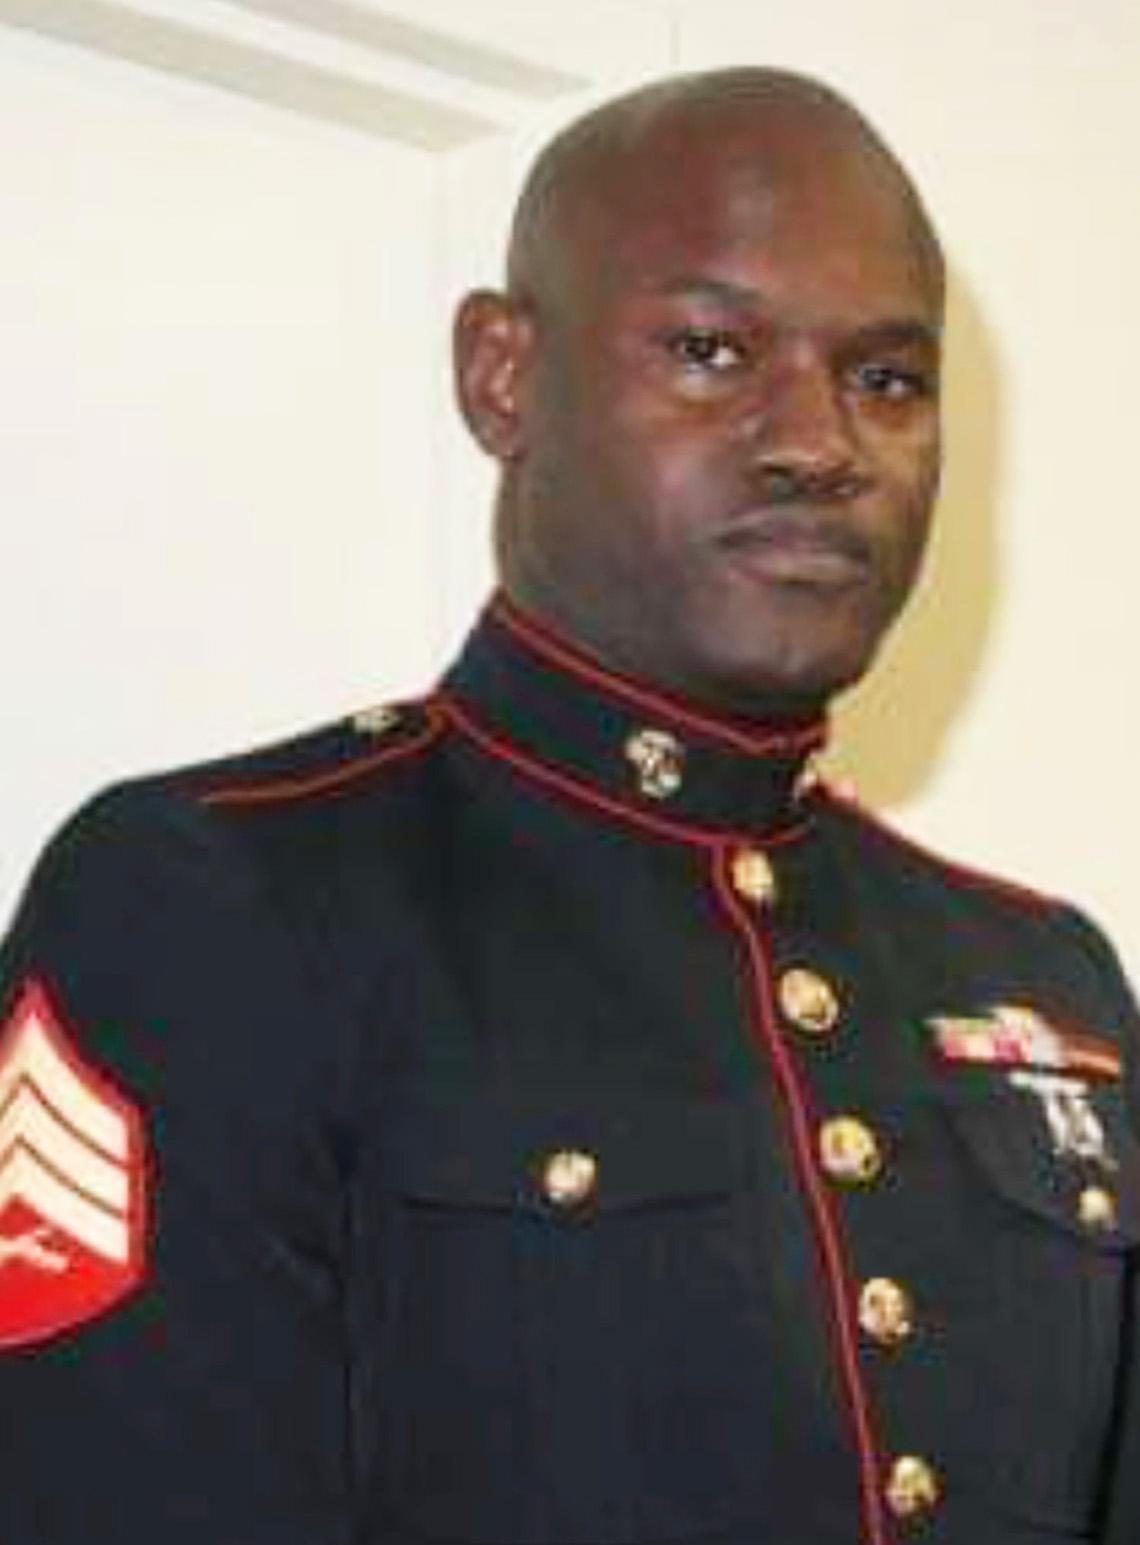 Photo of Thomas Bowman, Jr.. dressed in Marine's uniform